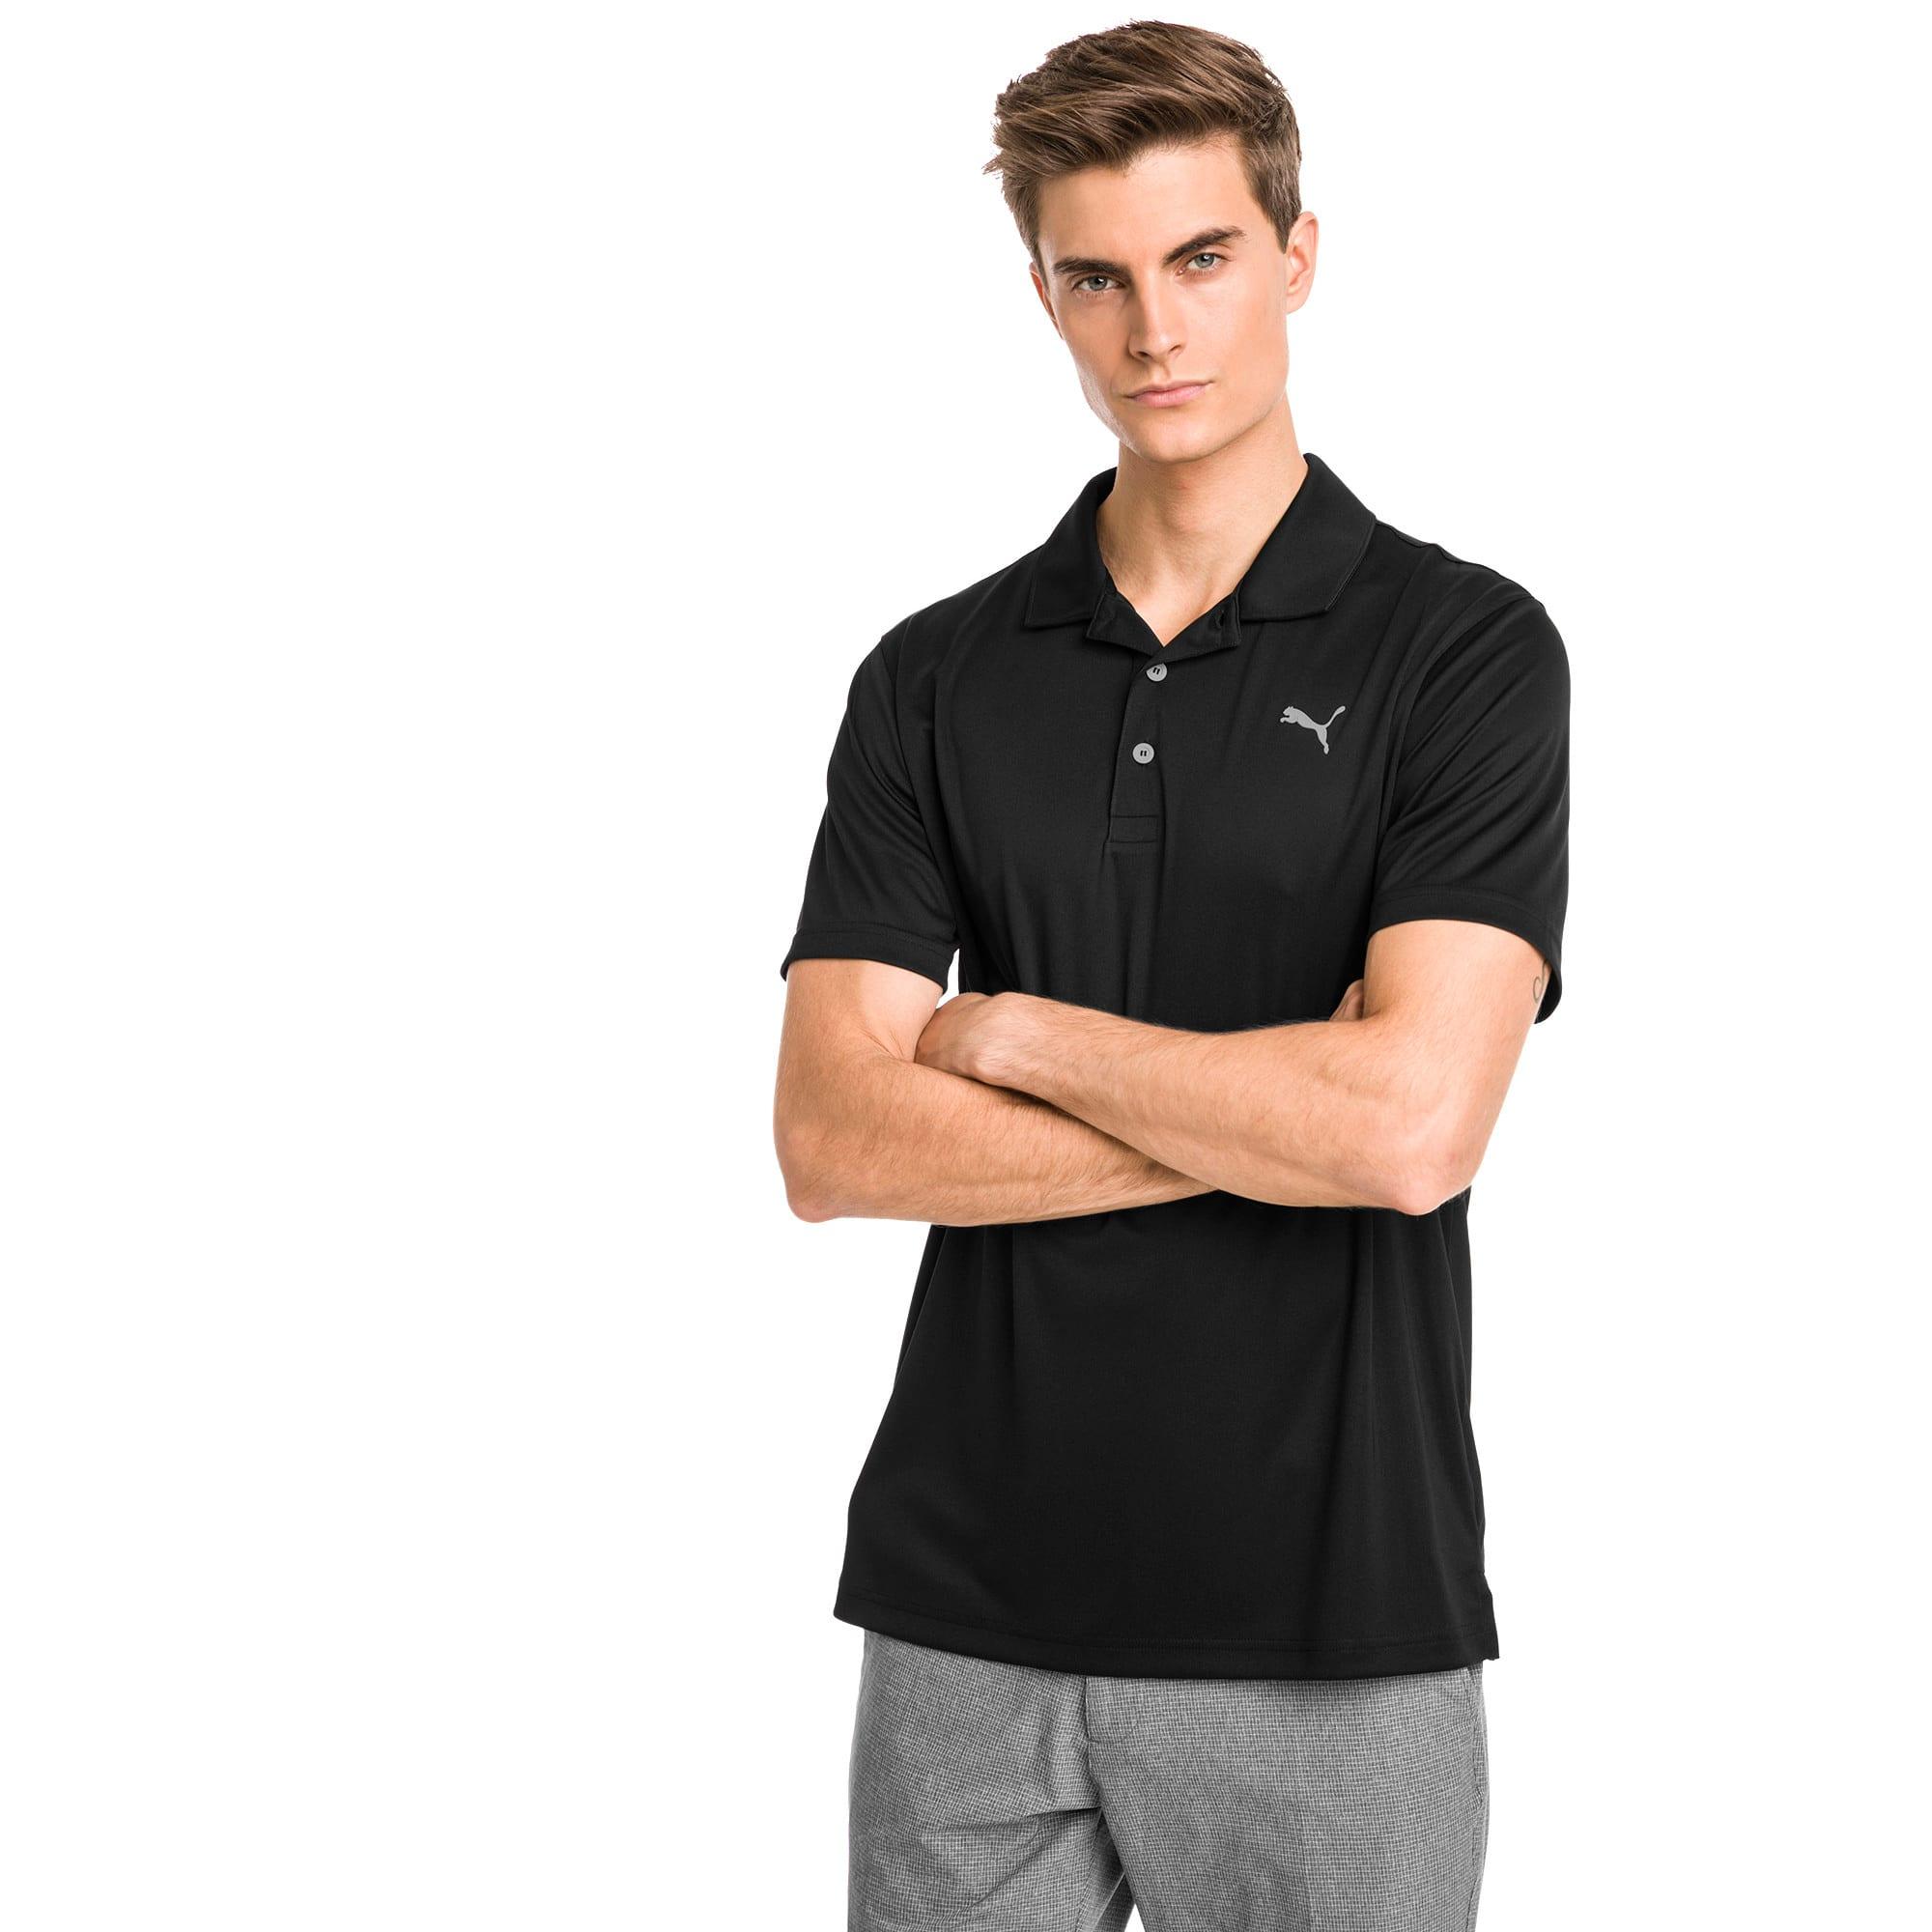 Thumbnail 1 of Rotation Herren Golf Polo, Puma Black, medium